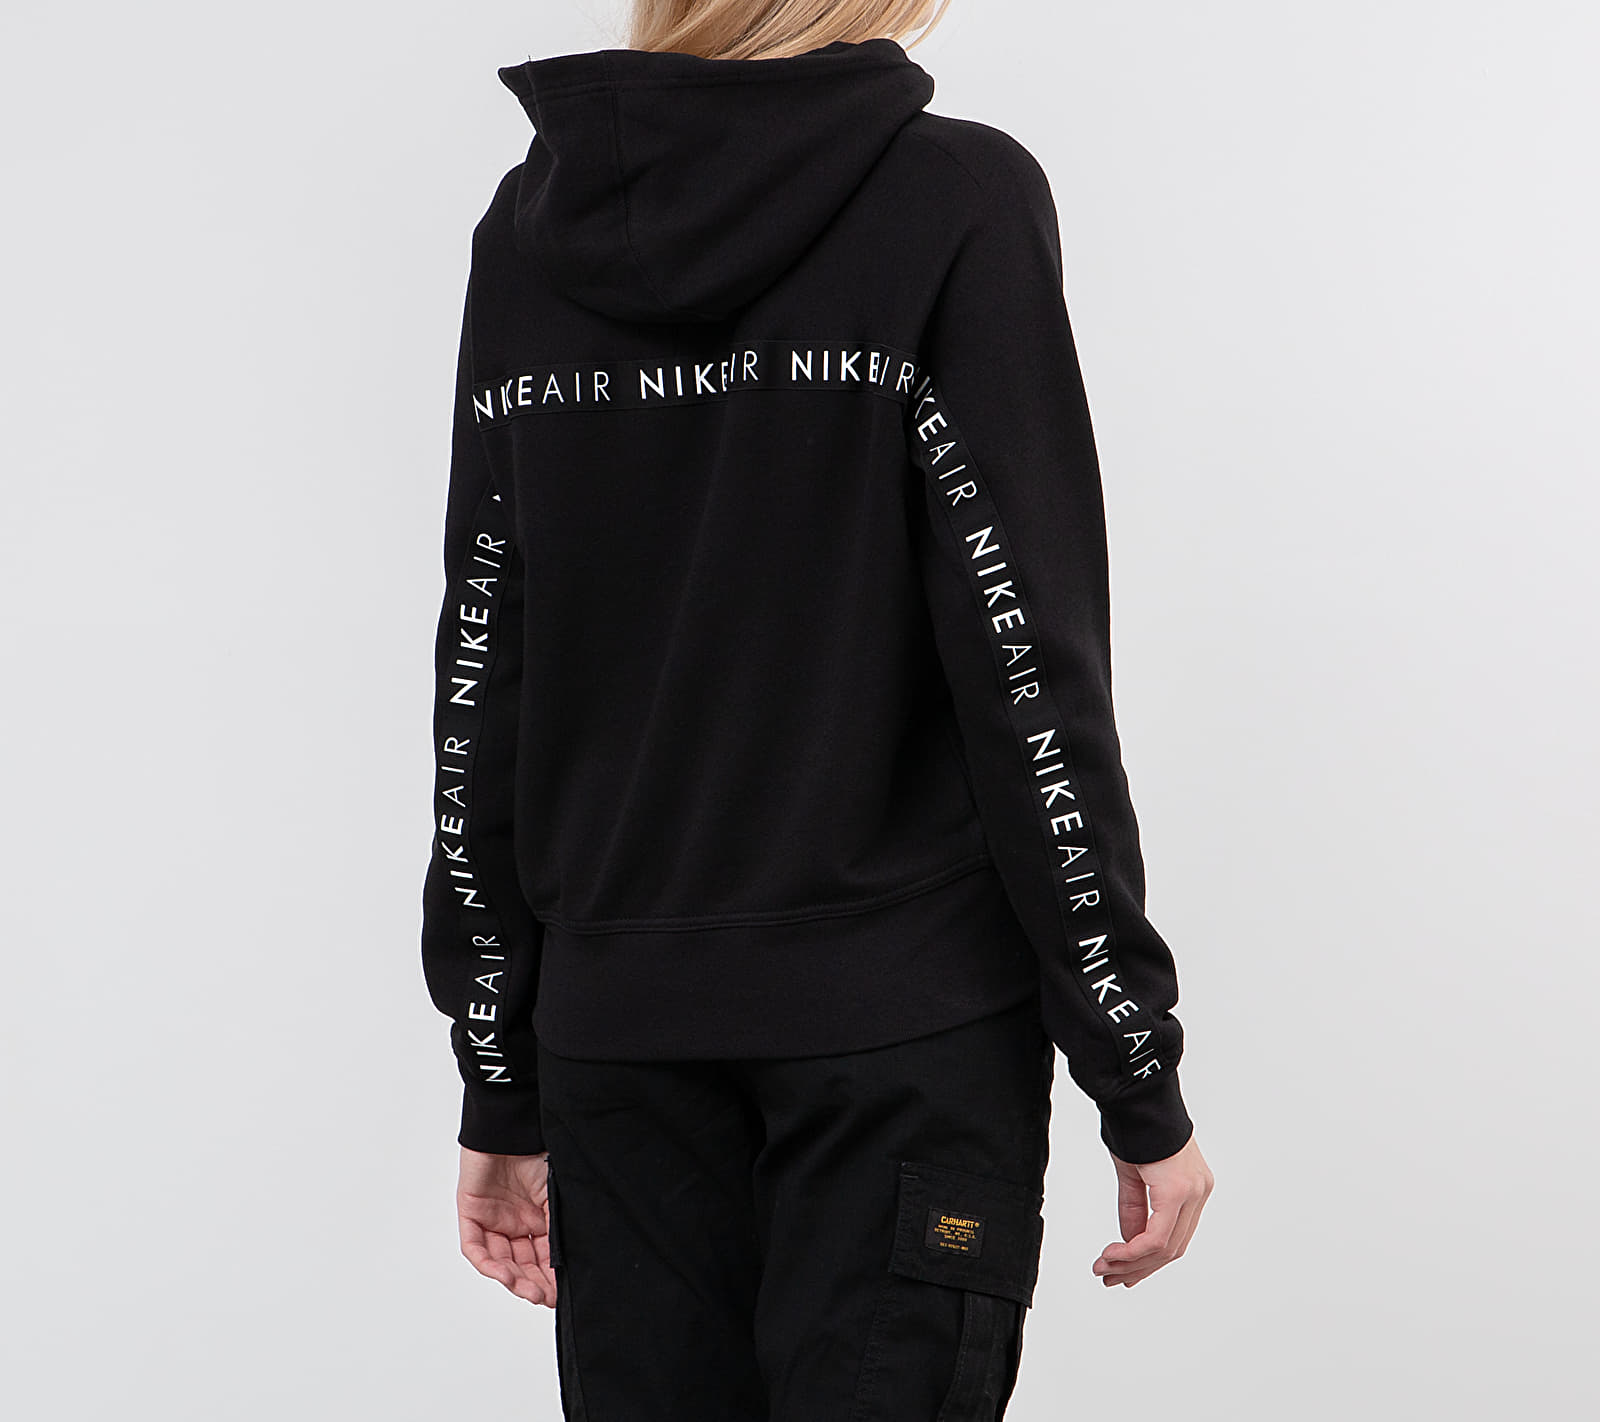 Nike Sportswear Air Hoodie Black/ White